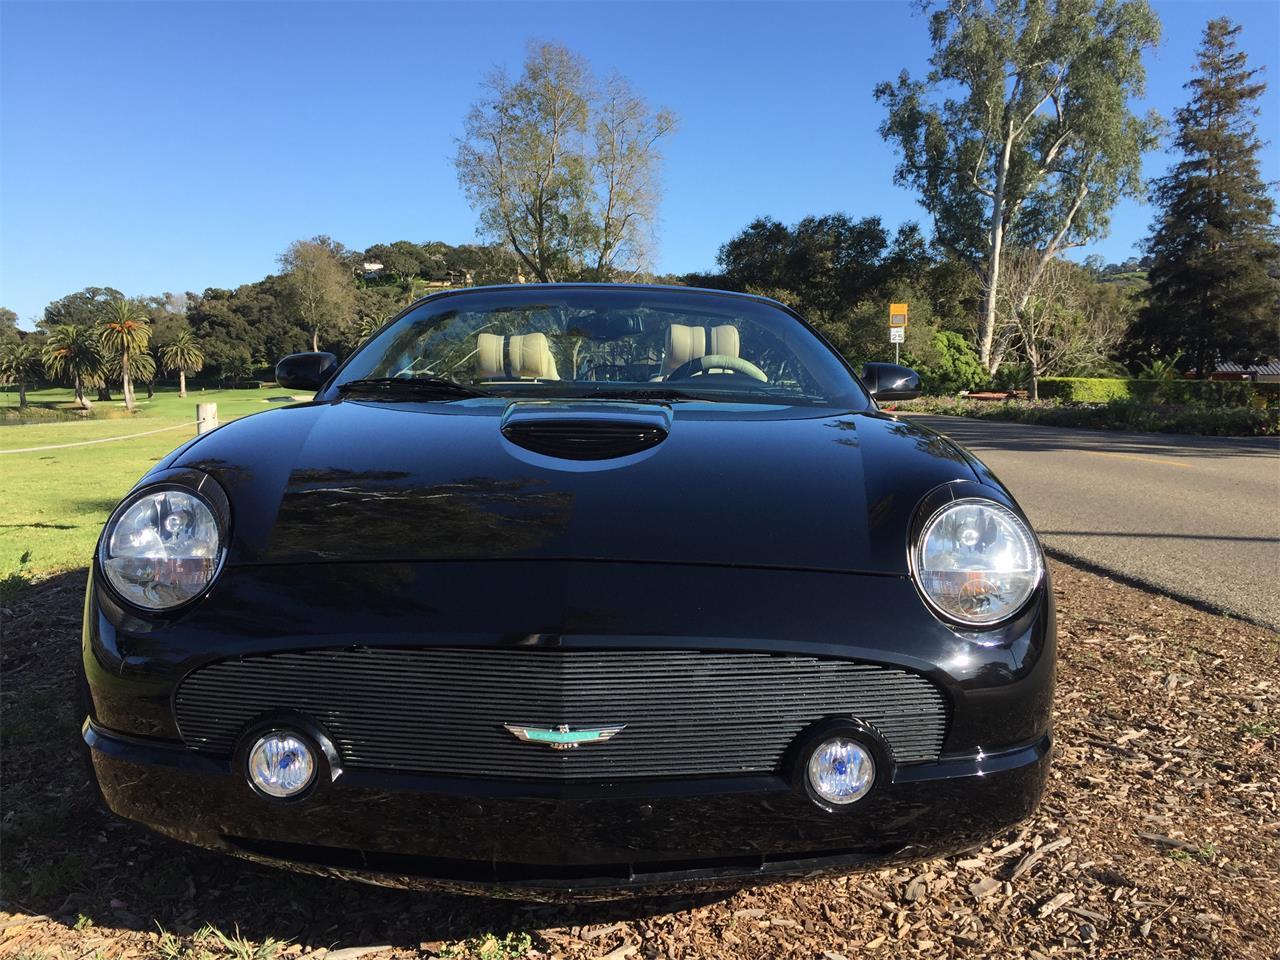 2005 Ford Thunderbird (CC-1331270) for sale in Santa Barbara, California